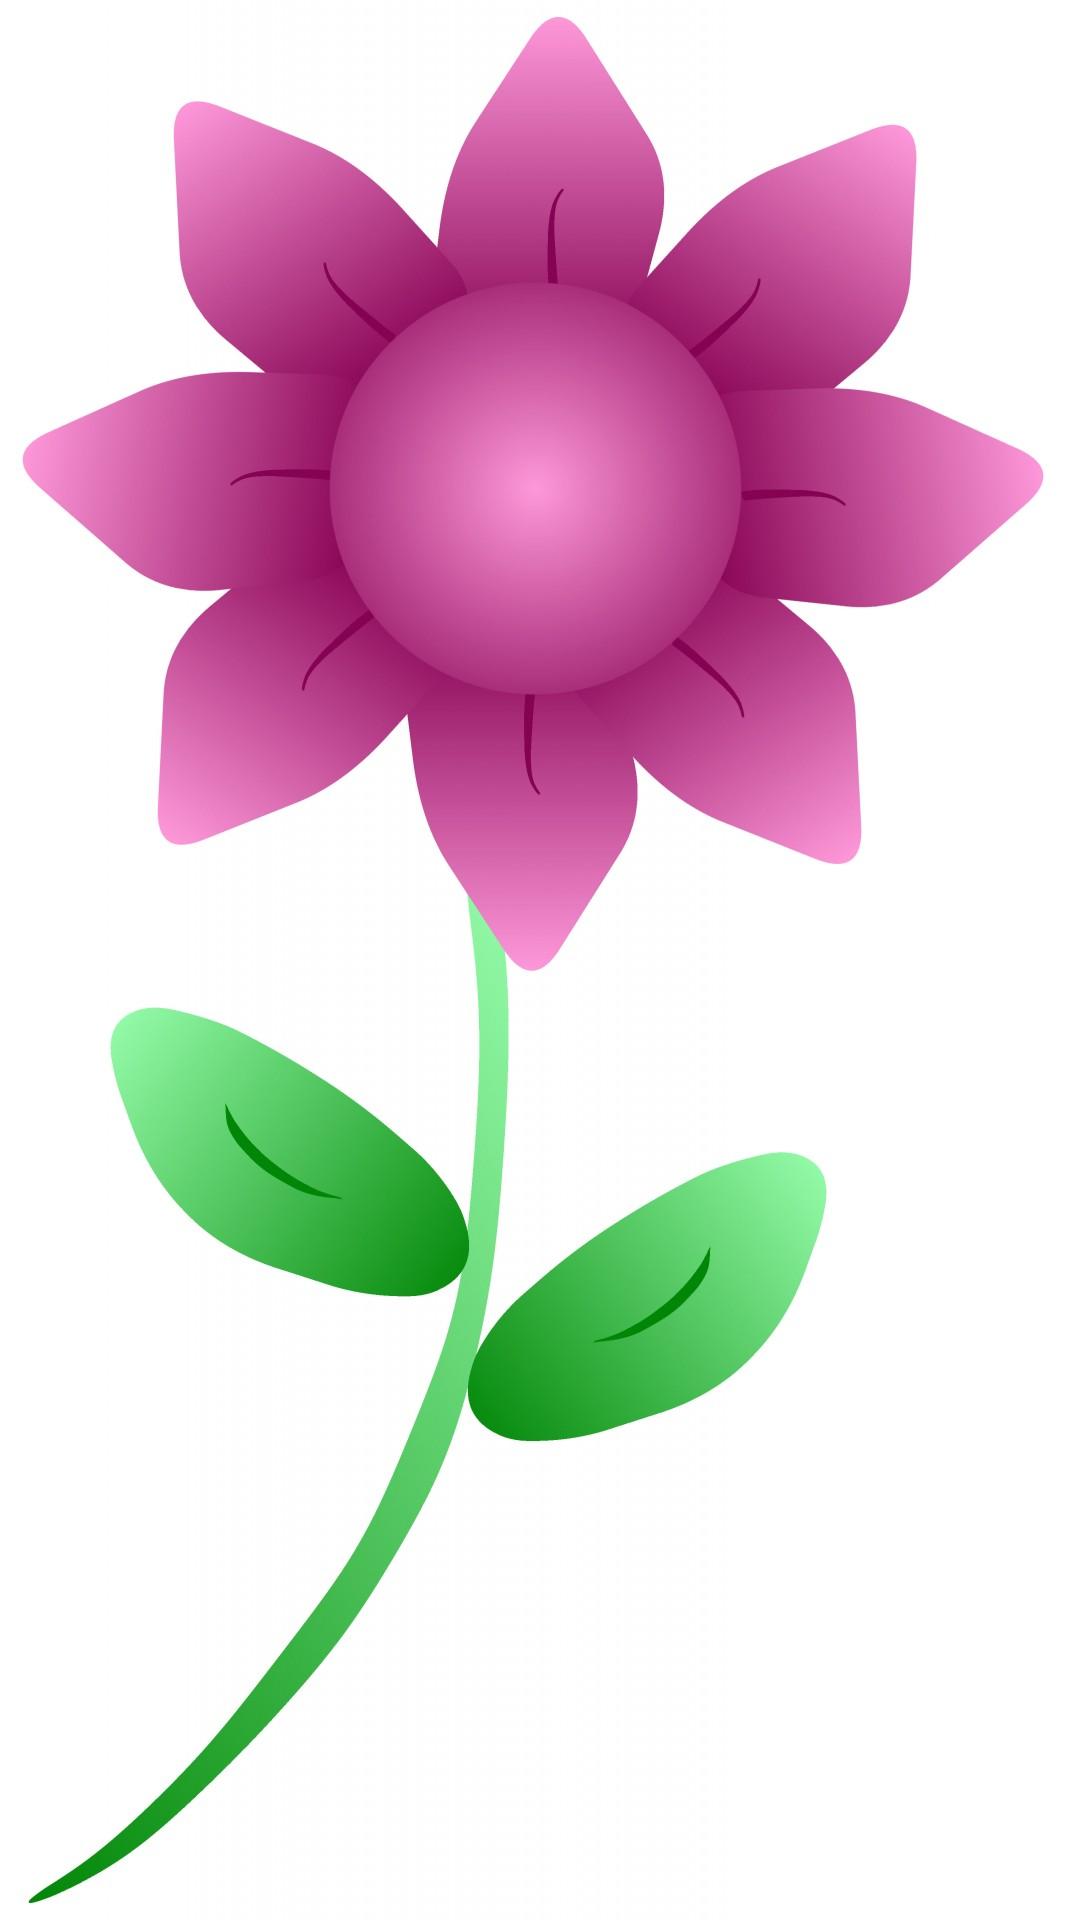 1066x1920 Flower Clip Art 1 Free Stock Photo